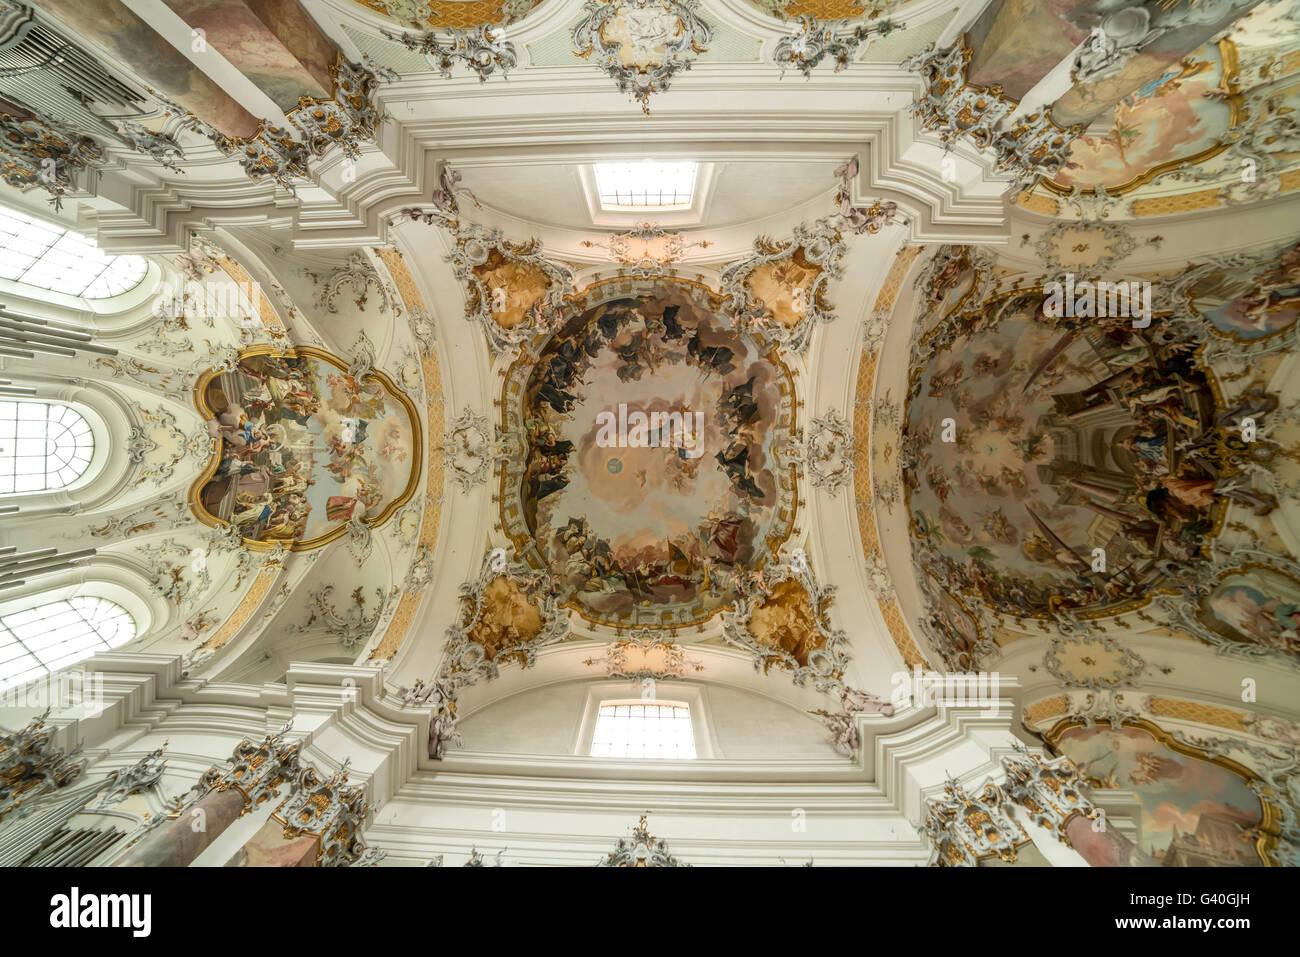 Ottobeuren abbey stock photos ottobeuren abbey stock images alamy baroque fresco on the ceiling of the basilica ottobeuren abbey allgu bavaria dailygadgetfo Image collections